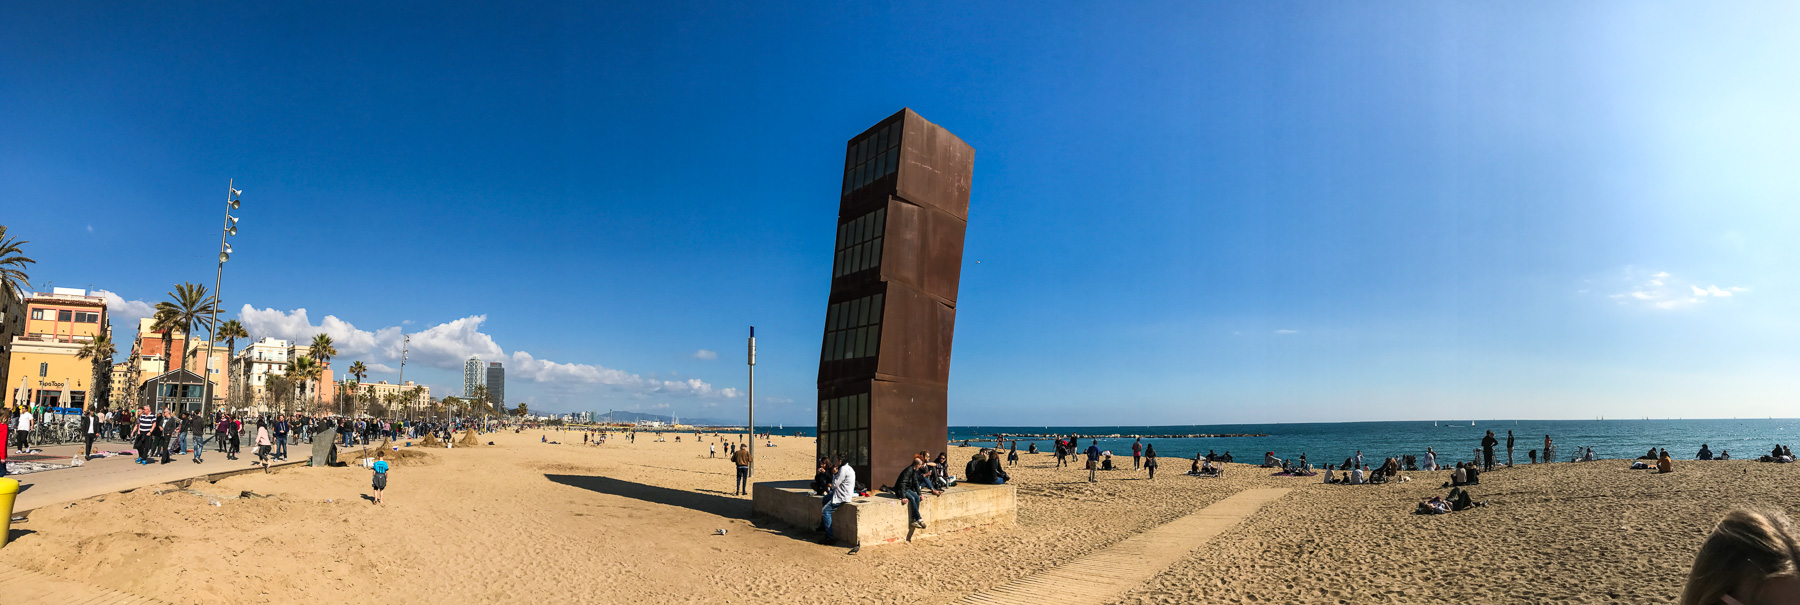 plaża la barceloneta w barcelonie